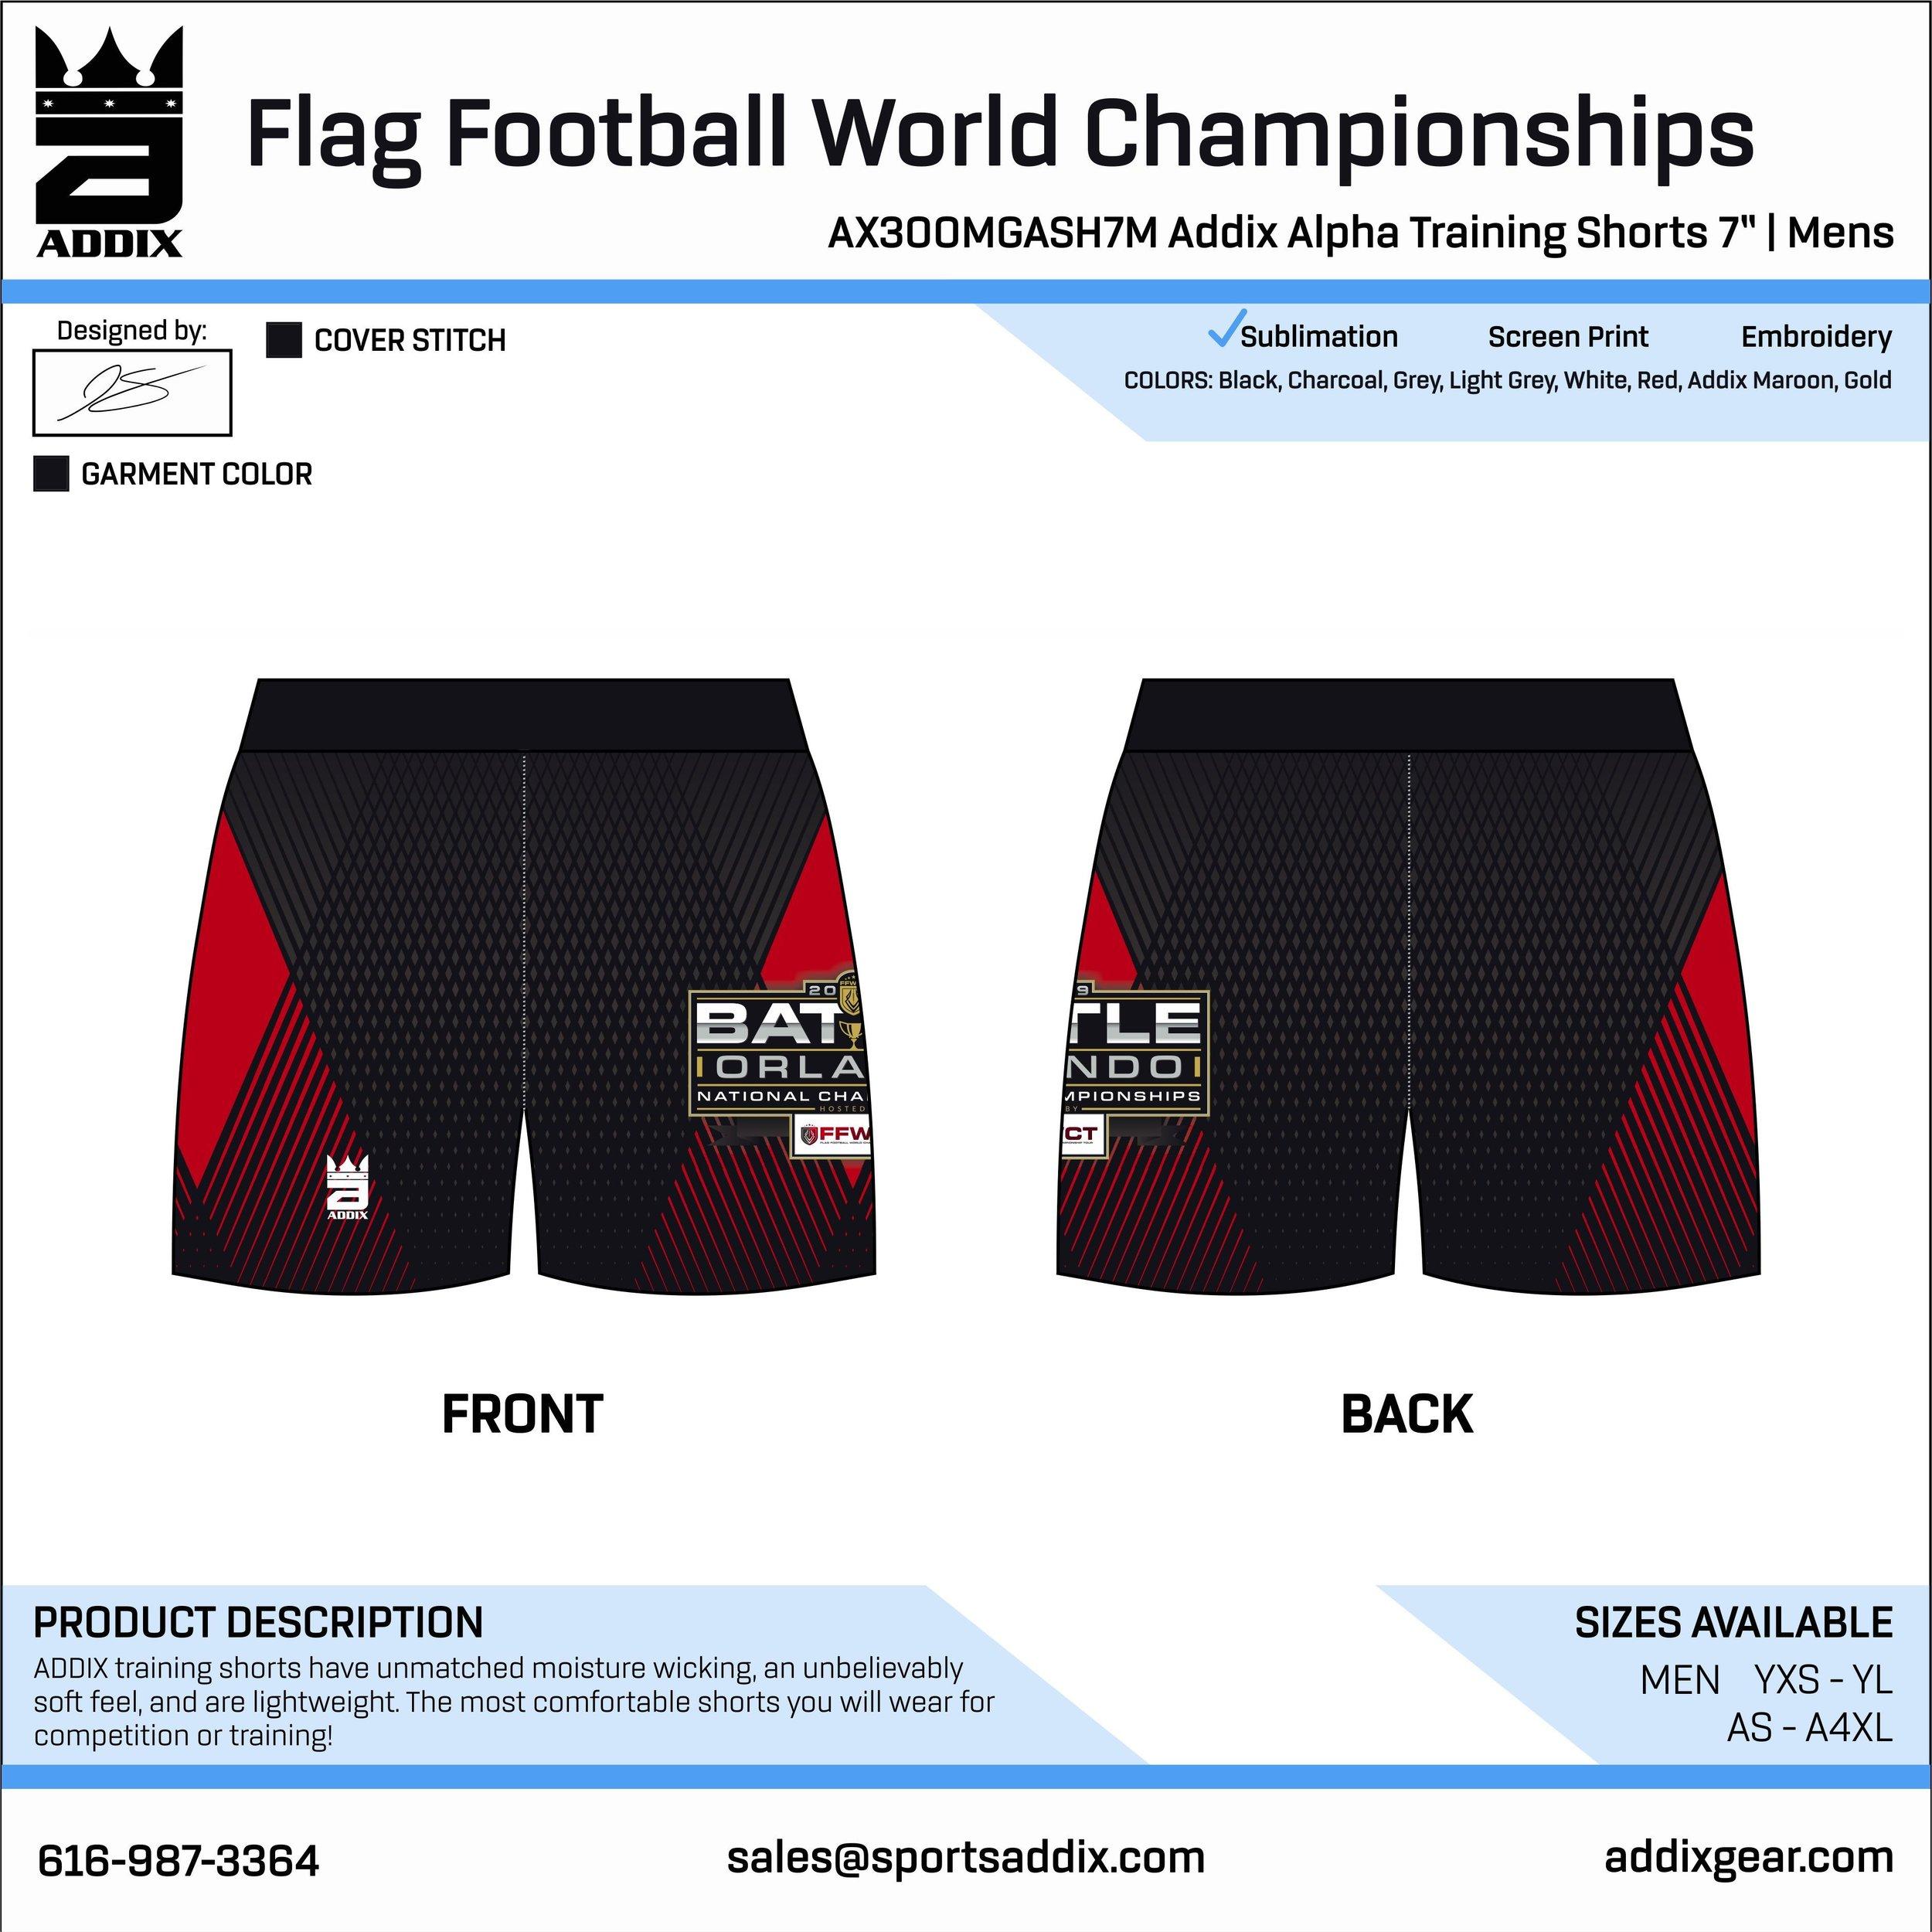 Flag Football World Championships_2018_12-19_JE_Alpha Training Shorts.jpg